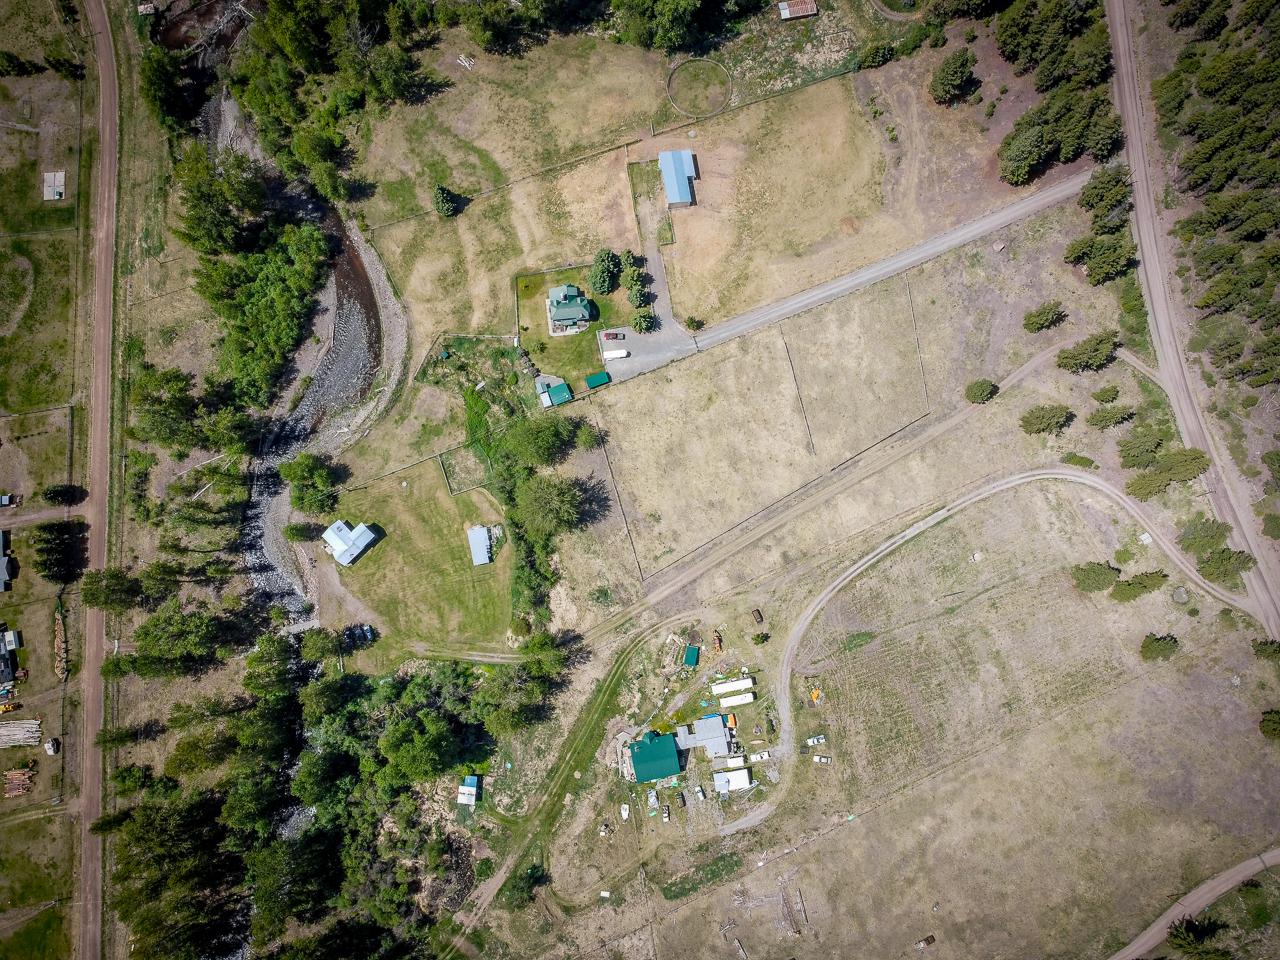 9781 Meadow Rd, Red Lake, Kamloops Real Estate for Sale